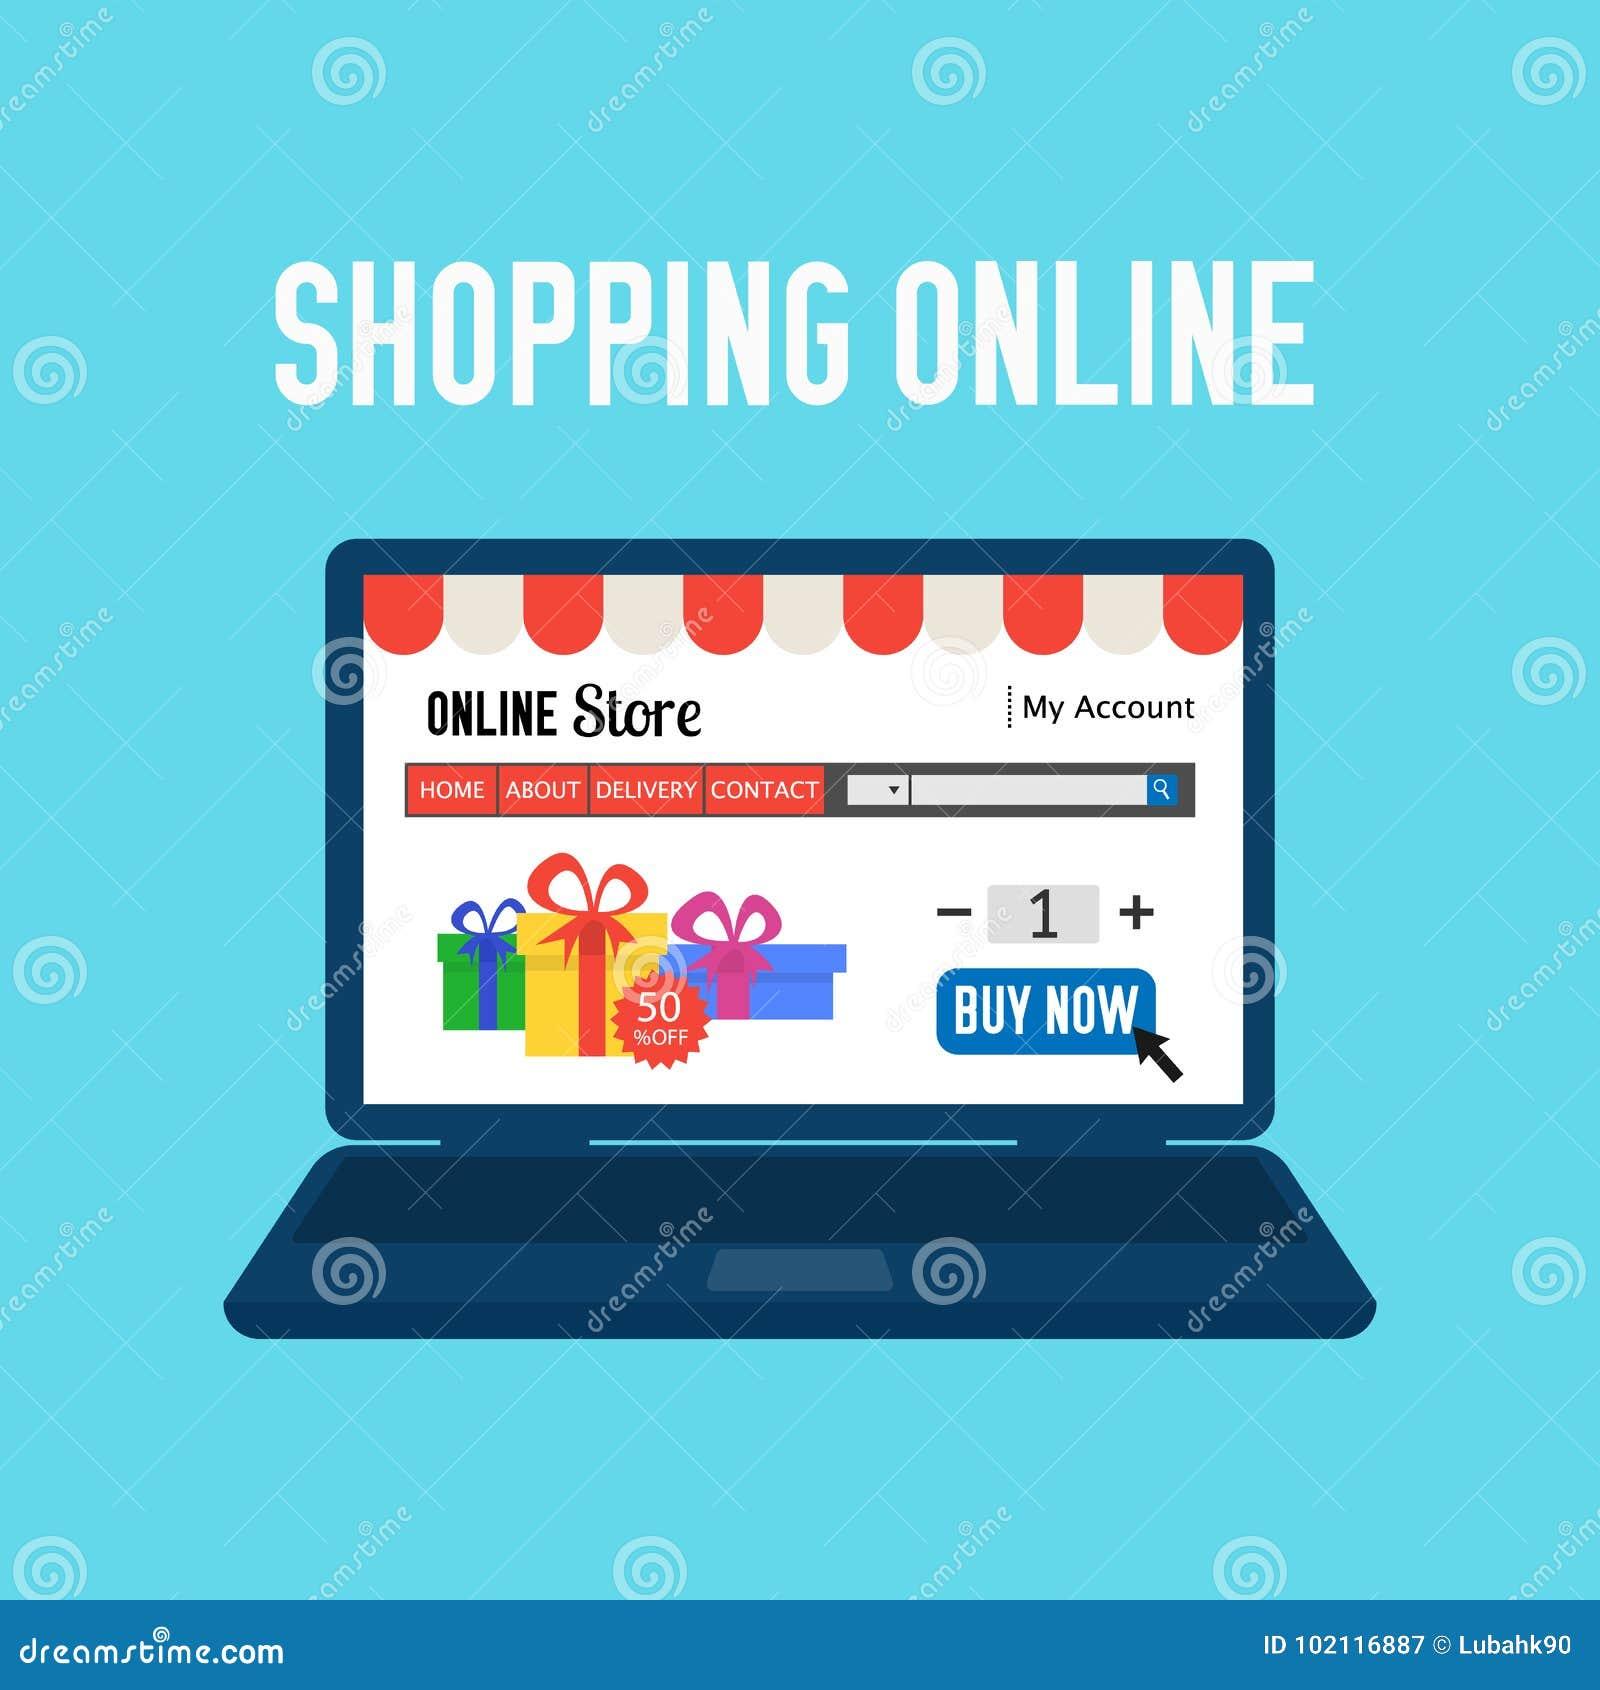 Online store shopping online e commerce shopping concept for Shop mobili online